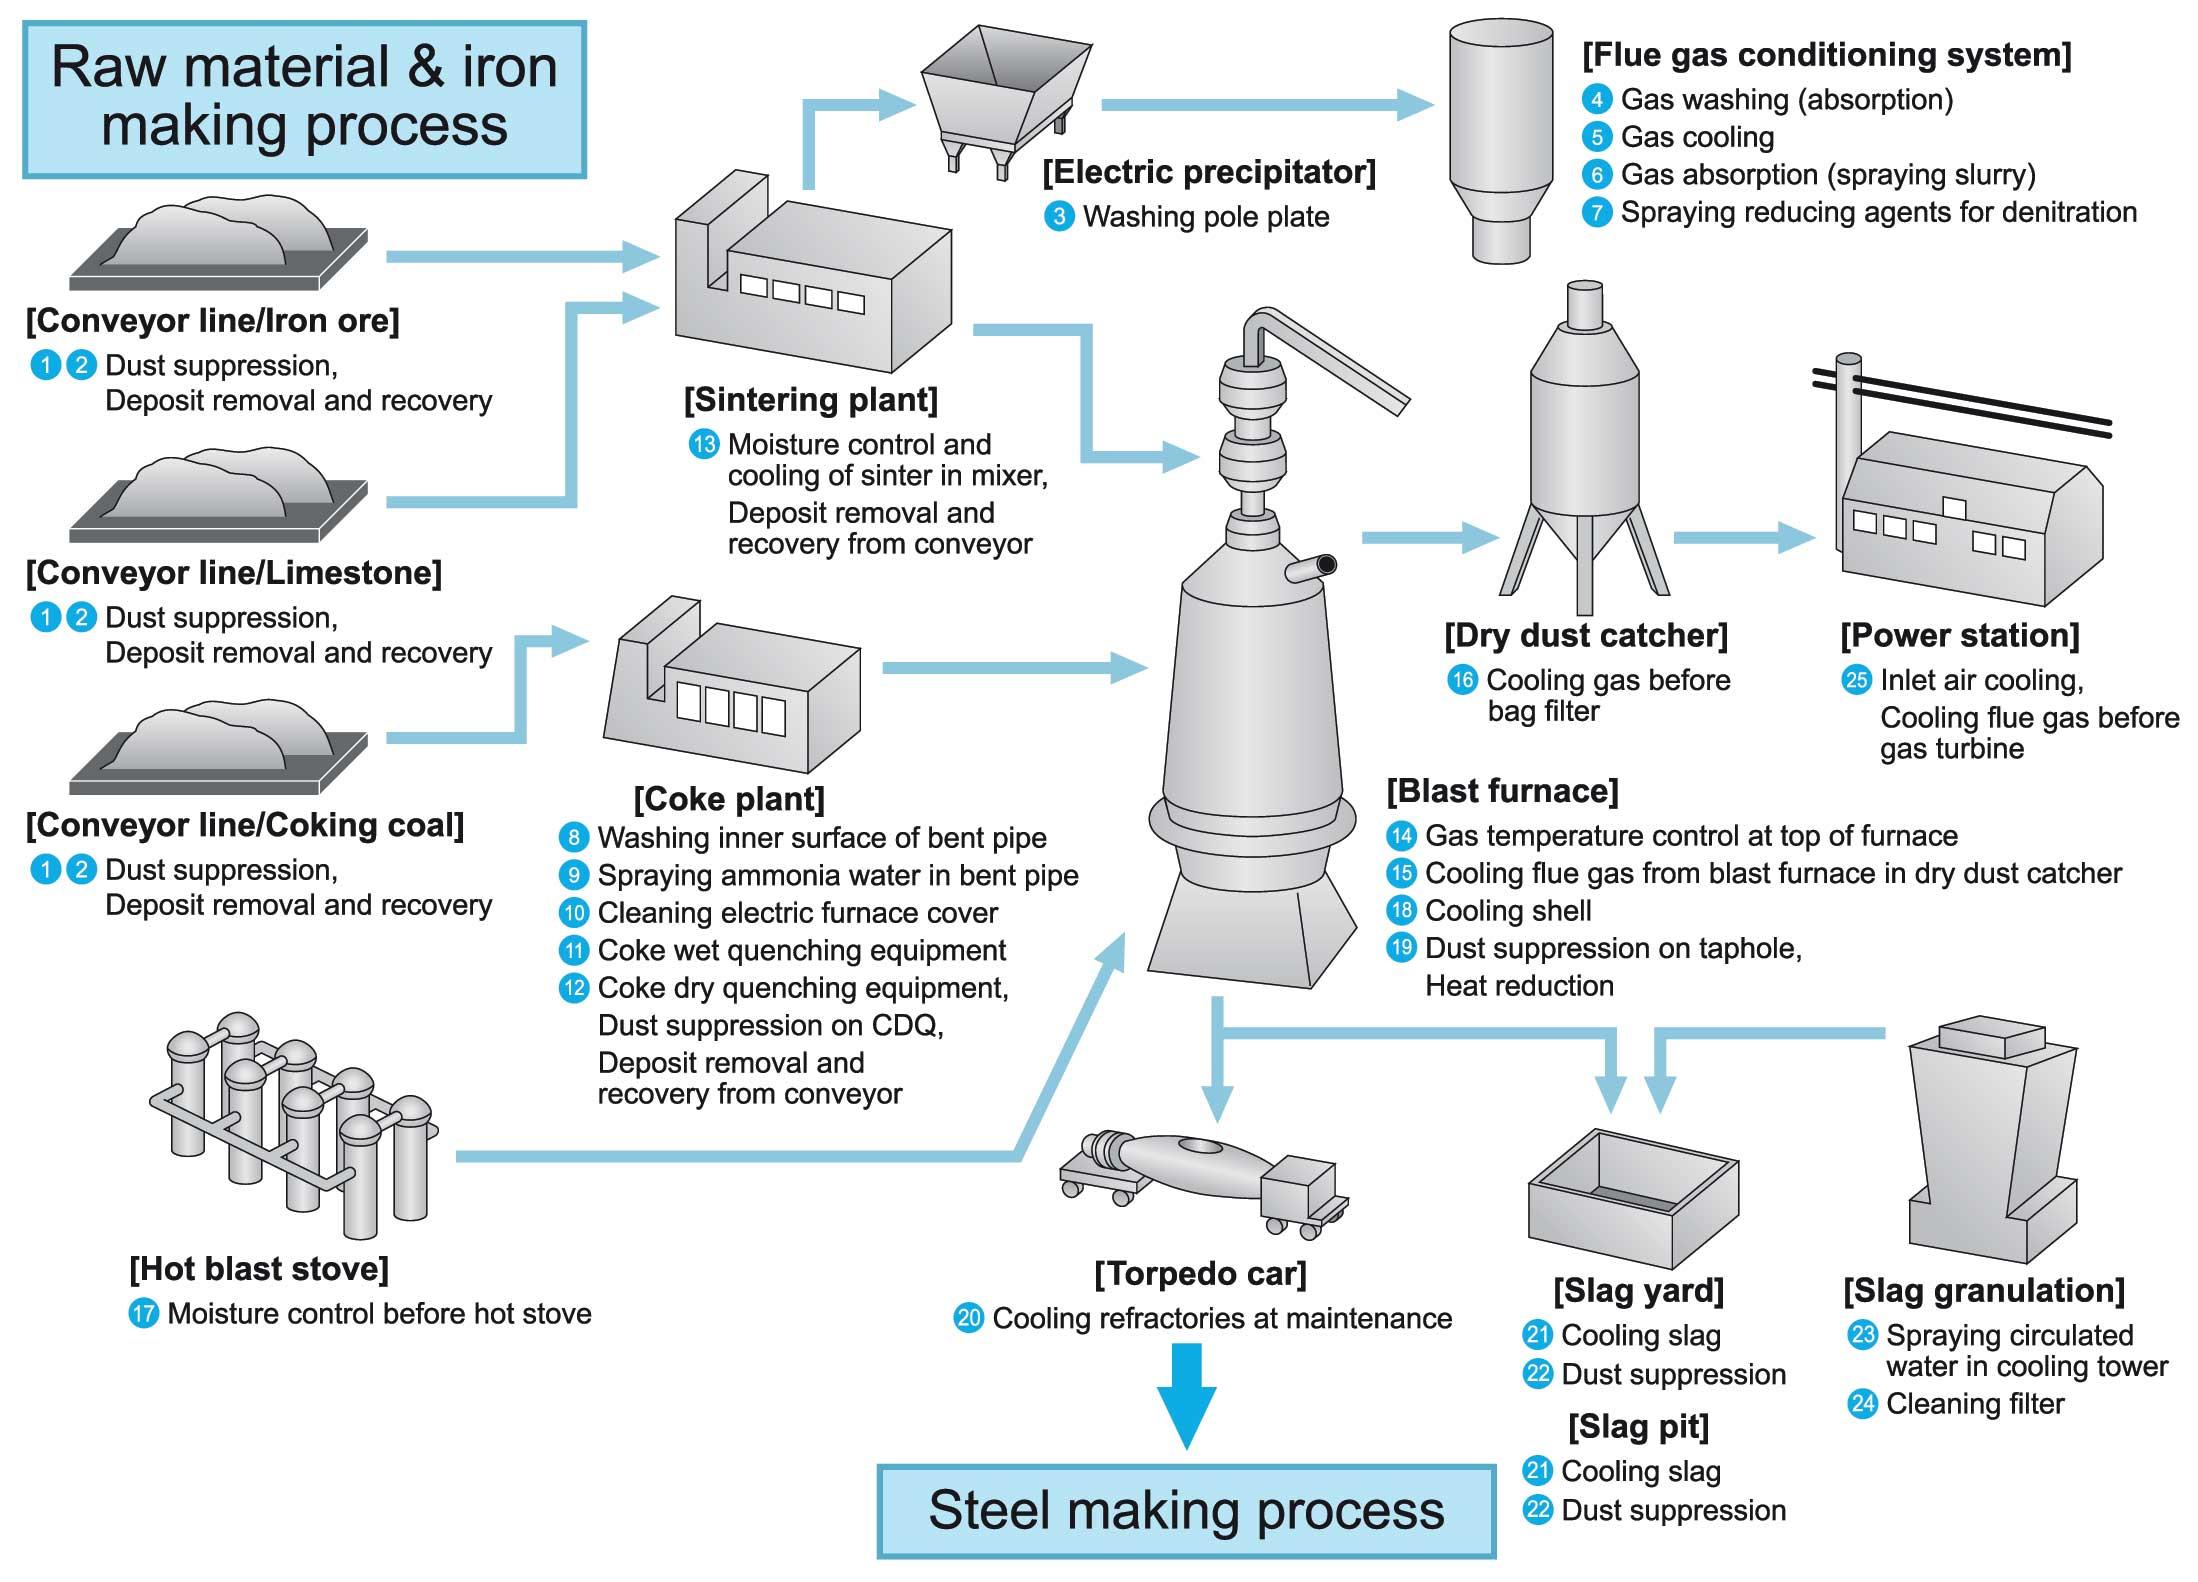 Raw-material-&-iron-making-process